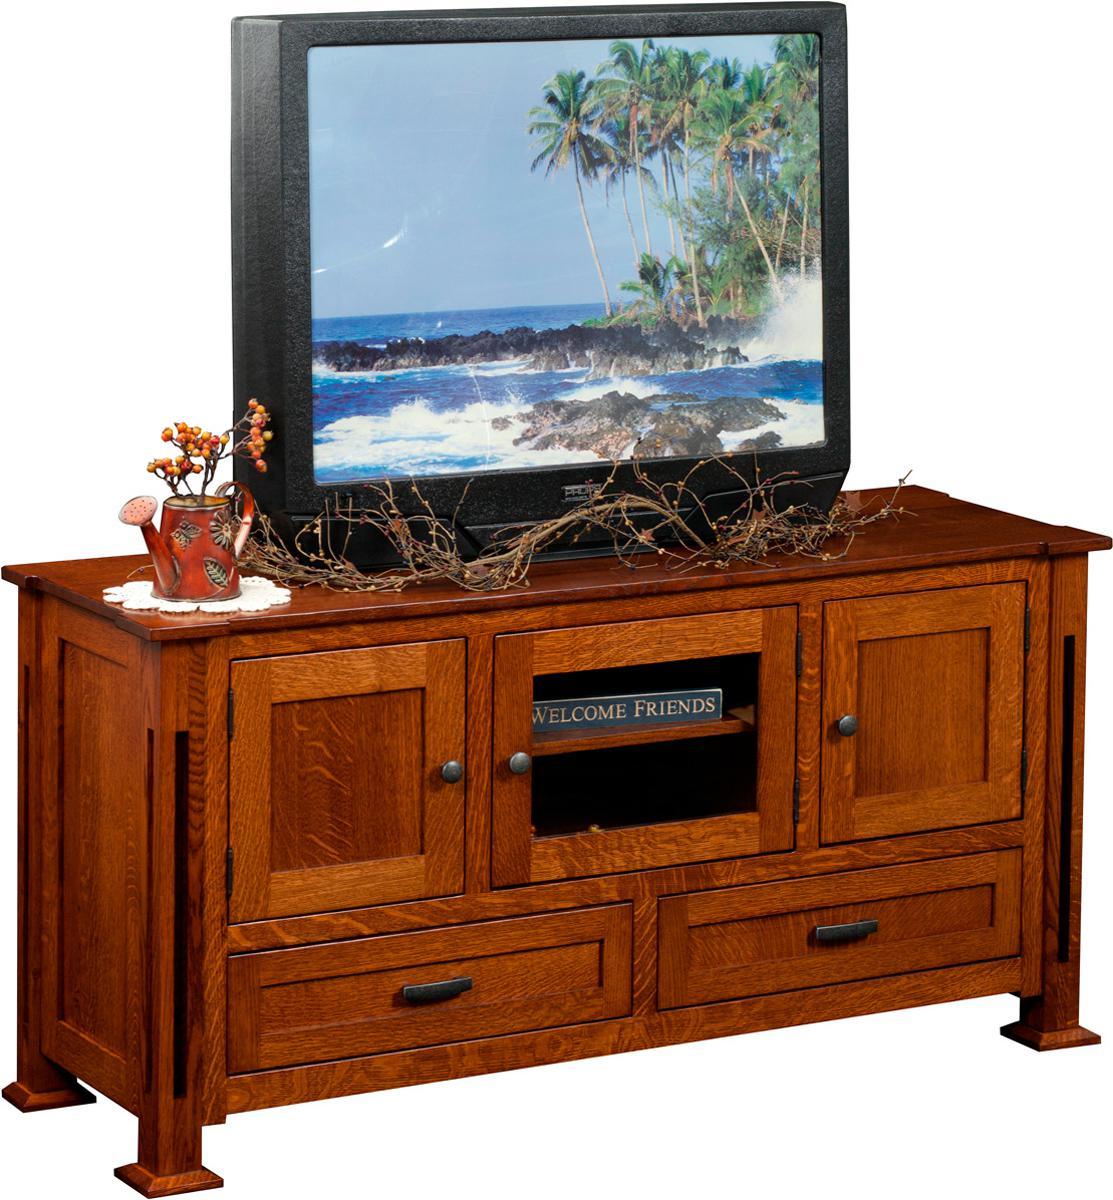 Parker Mission TV Stand - wide